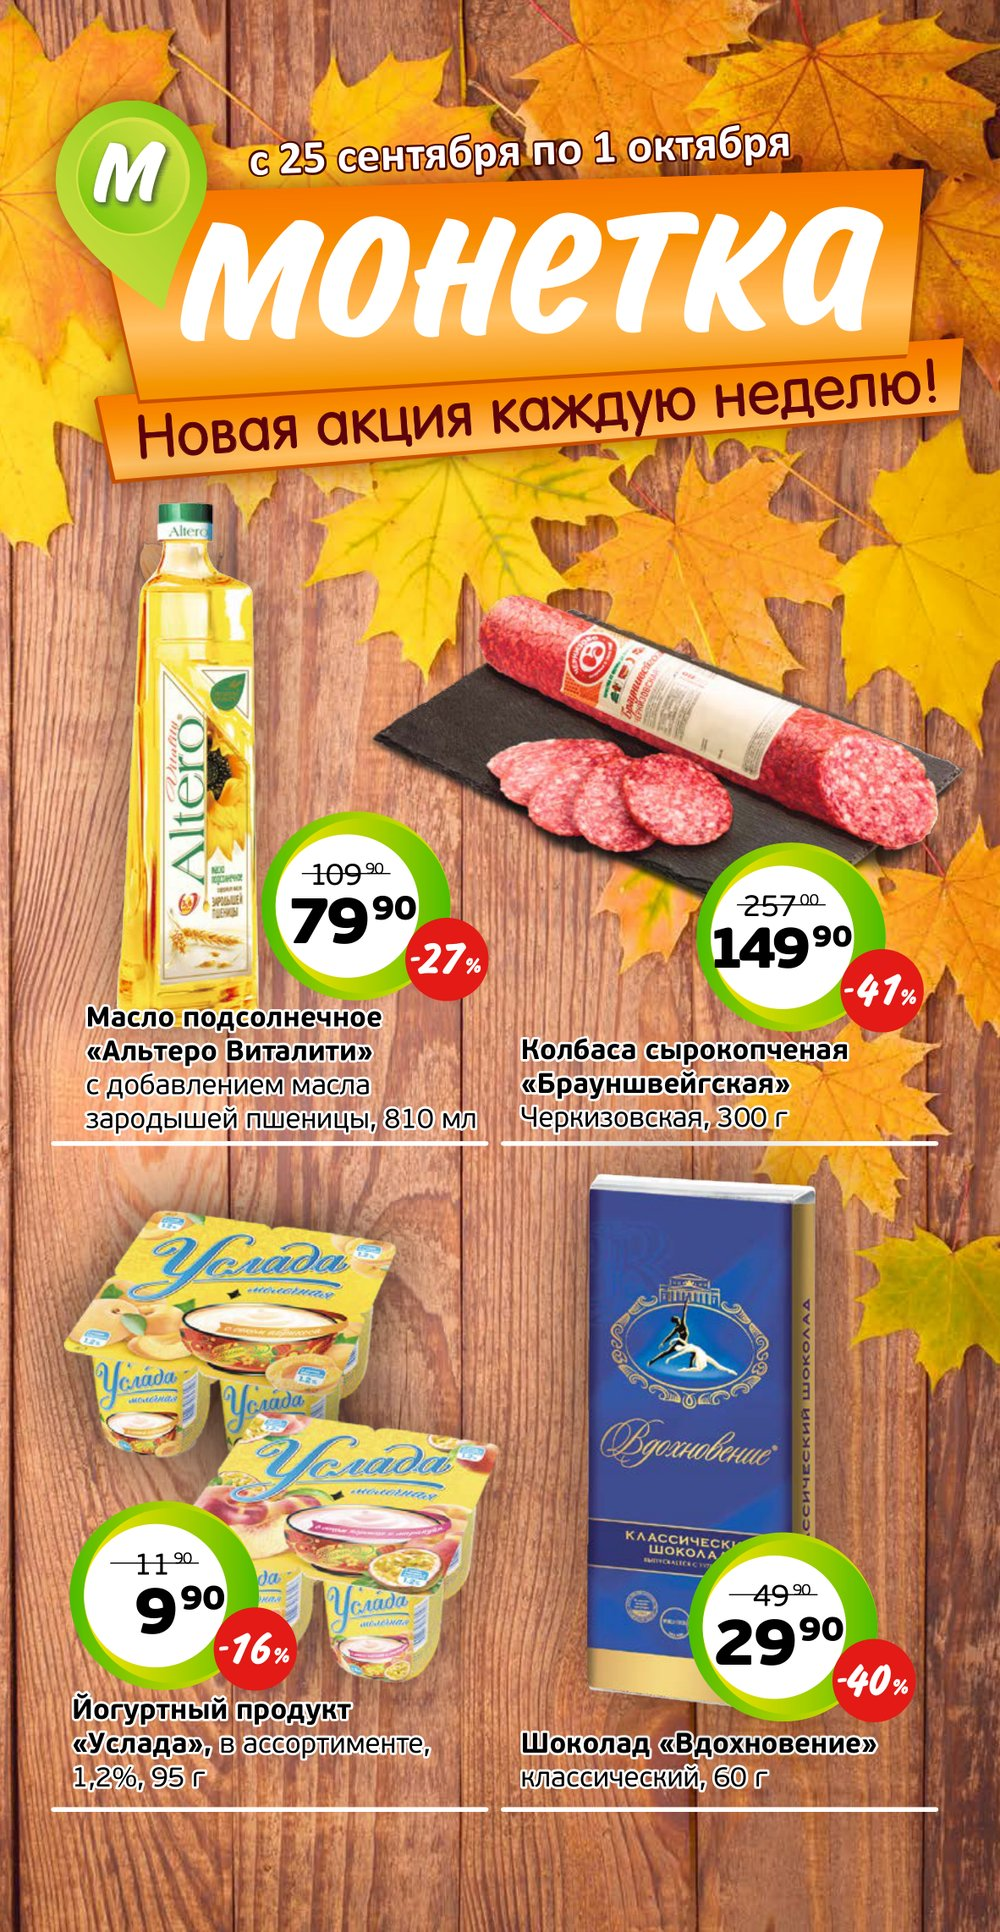 Каталог акций Монетка с 25 сентября по 1 октября 2017 - стр. 1